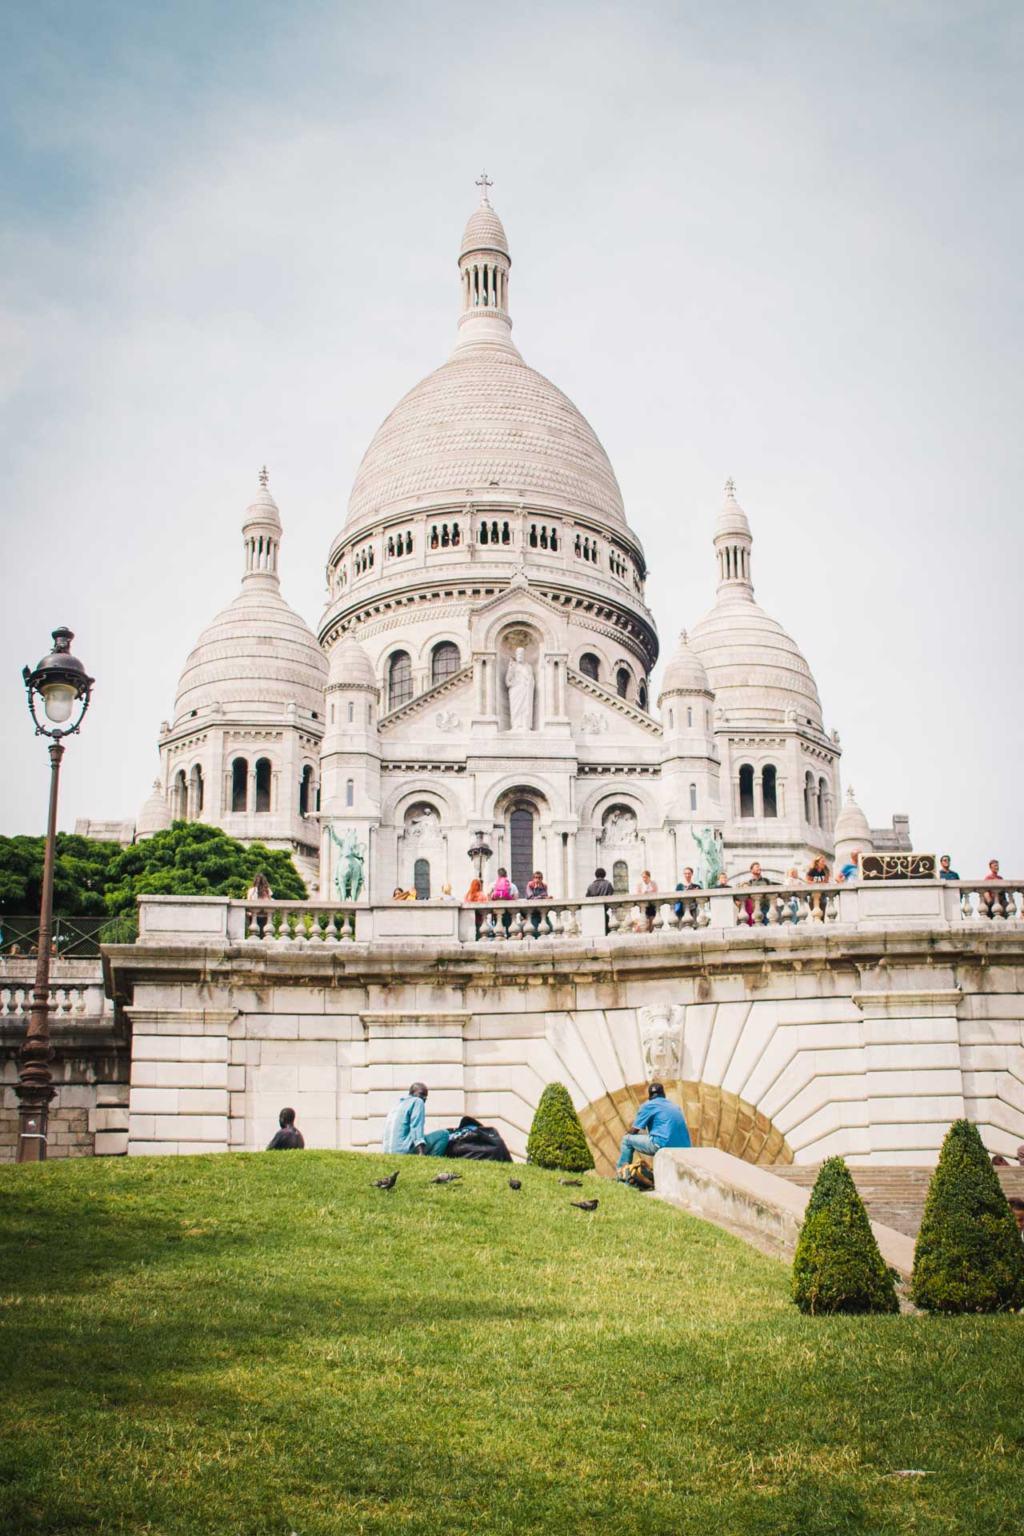 Sacre Coeur Balisica, Montmarte, Paris